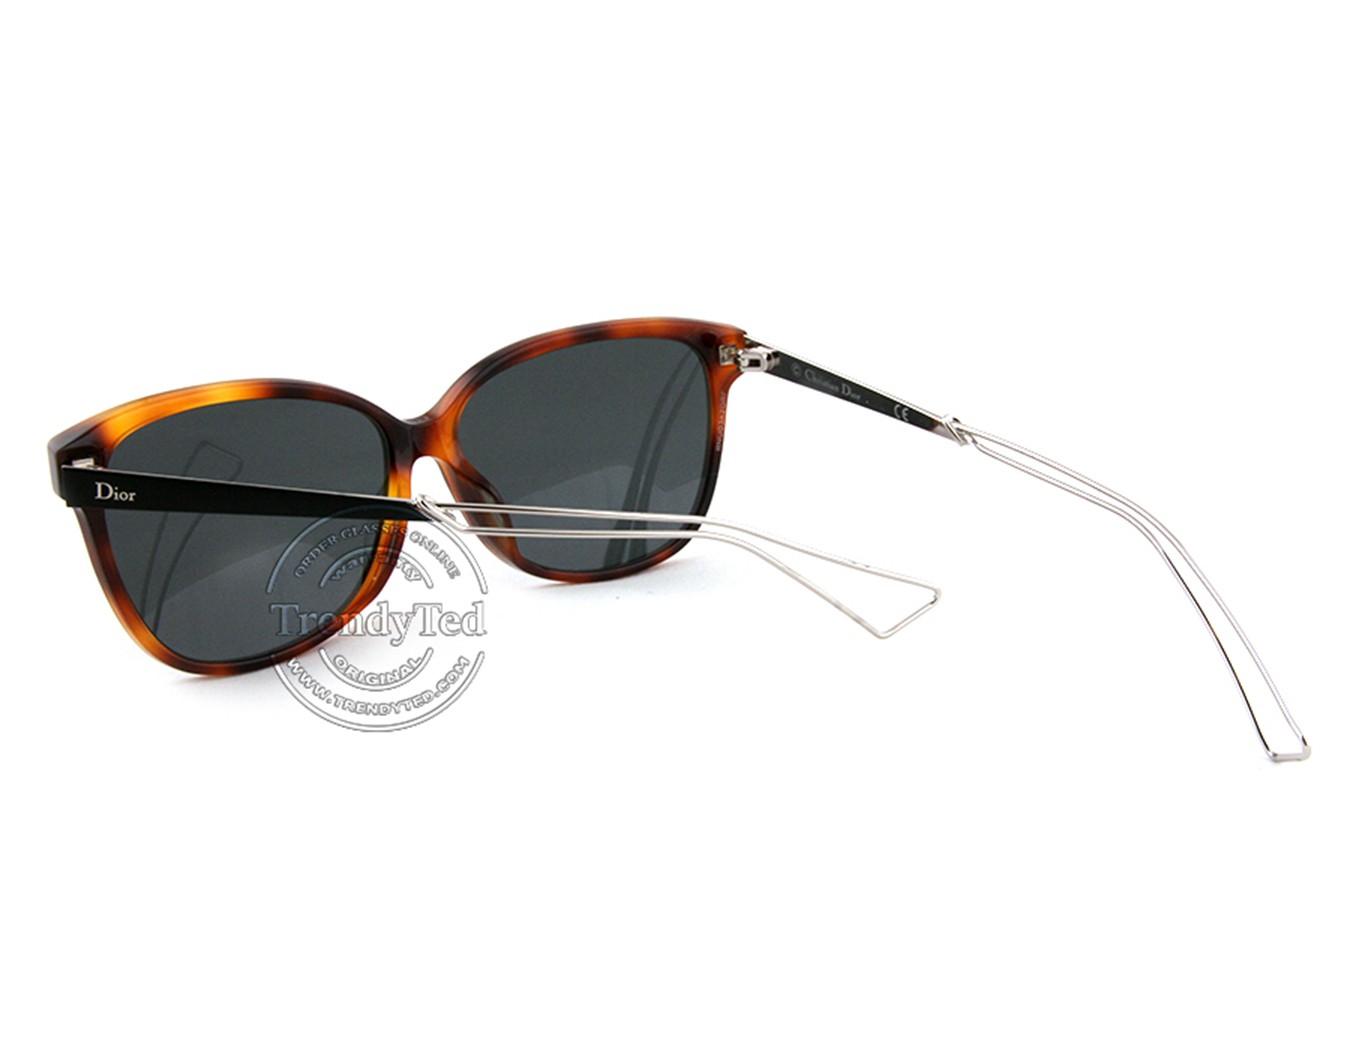 Momo On Design Color Trendyted Model Q39g Smd008 Sunglasses orWdxCBe